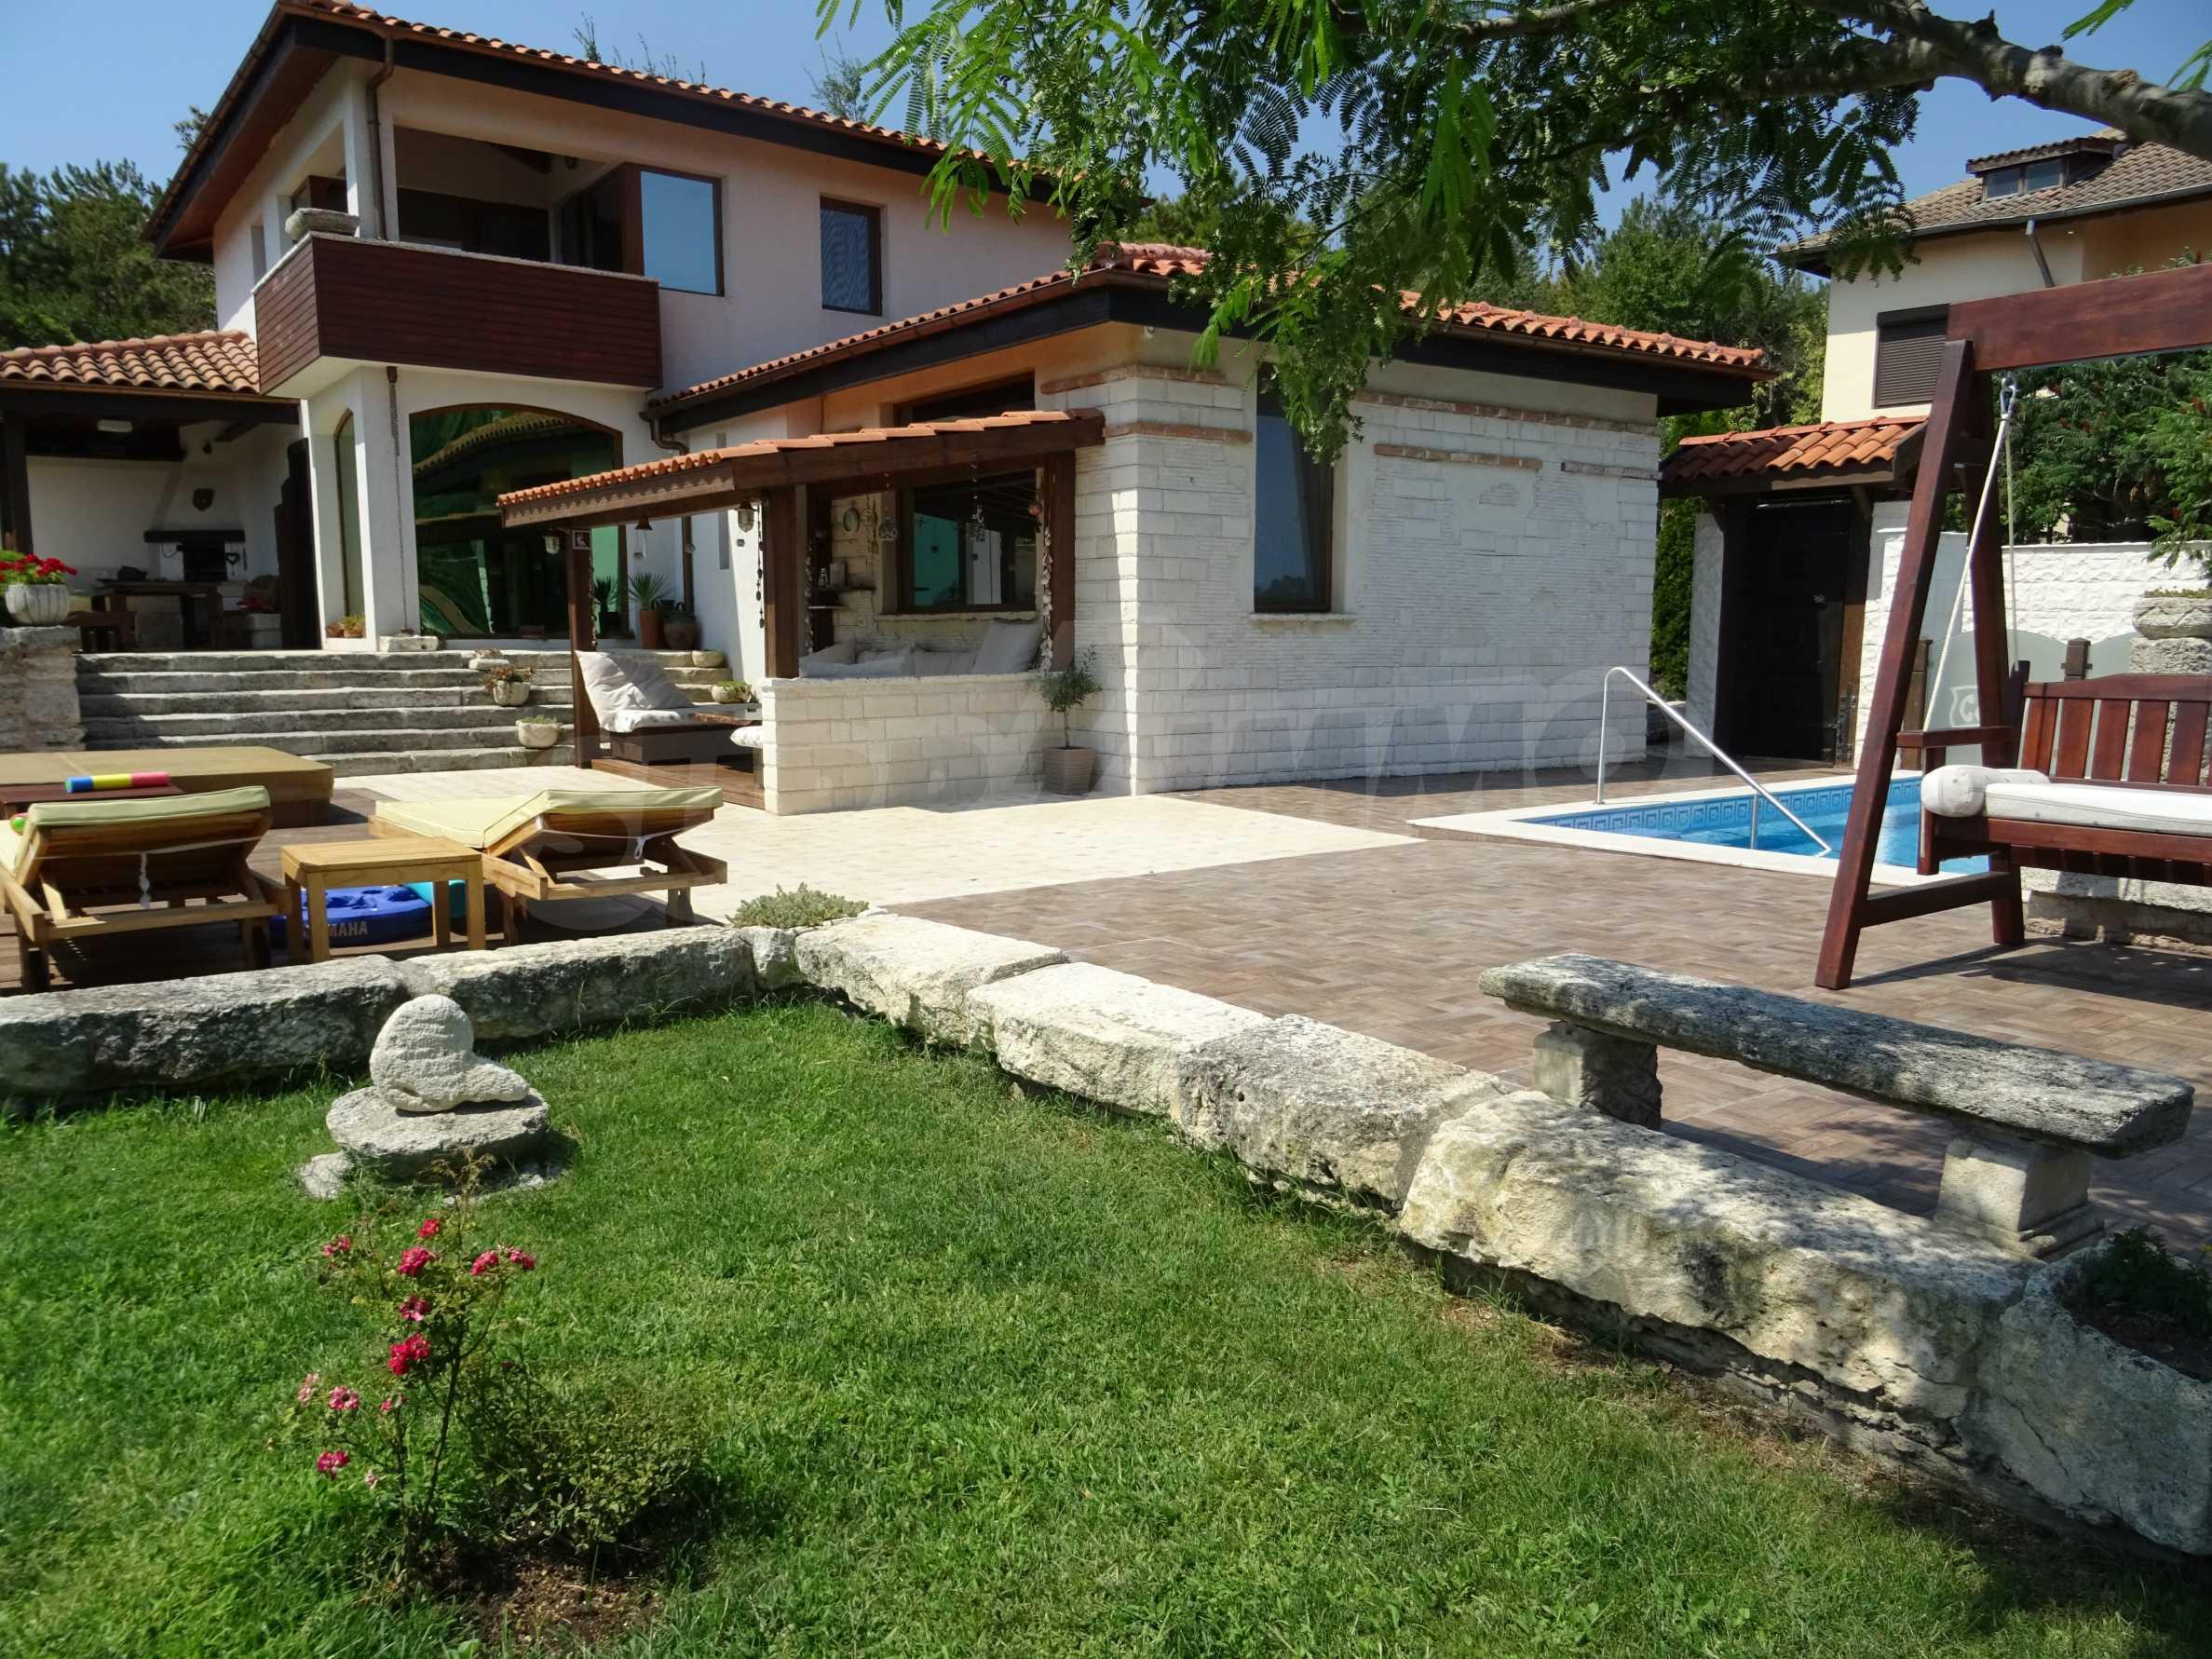 The Mediterranean style - a sense of luxury